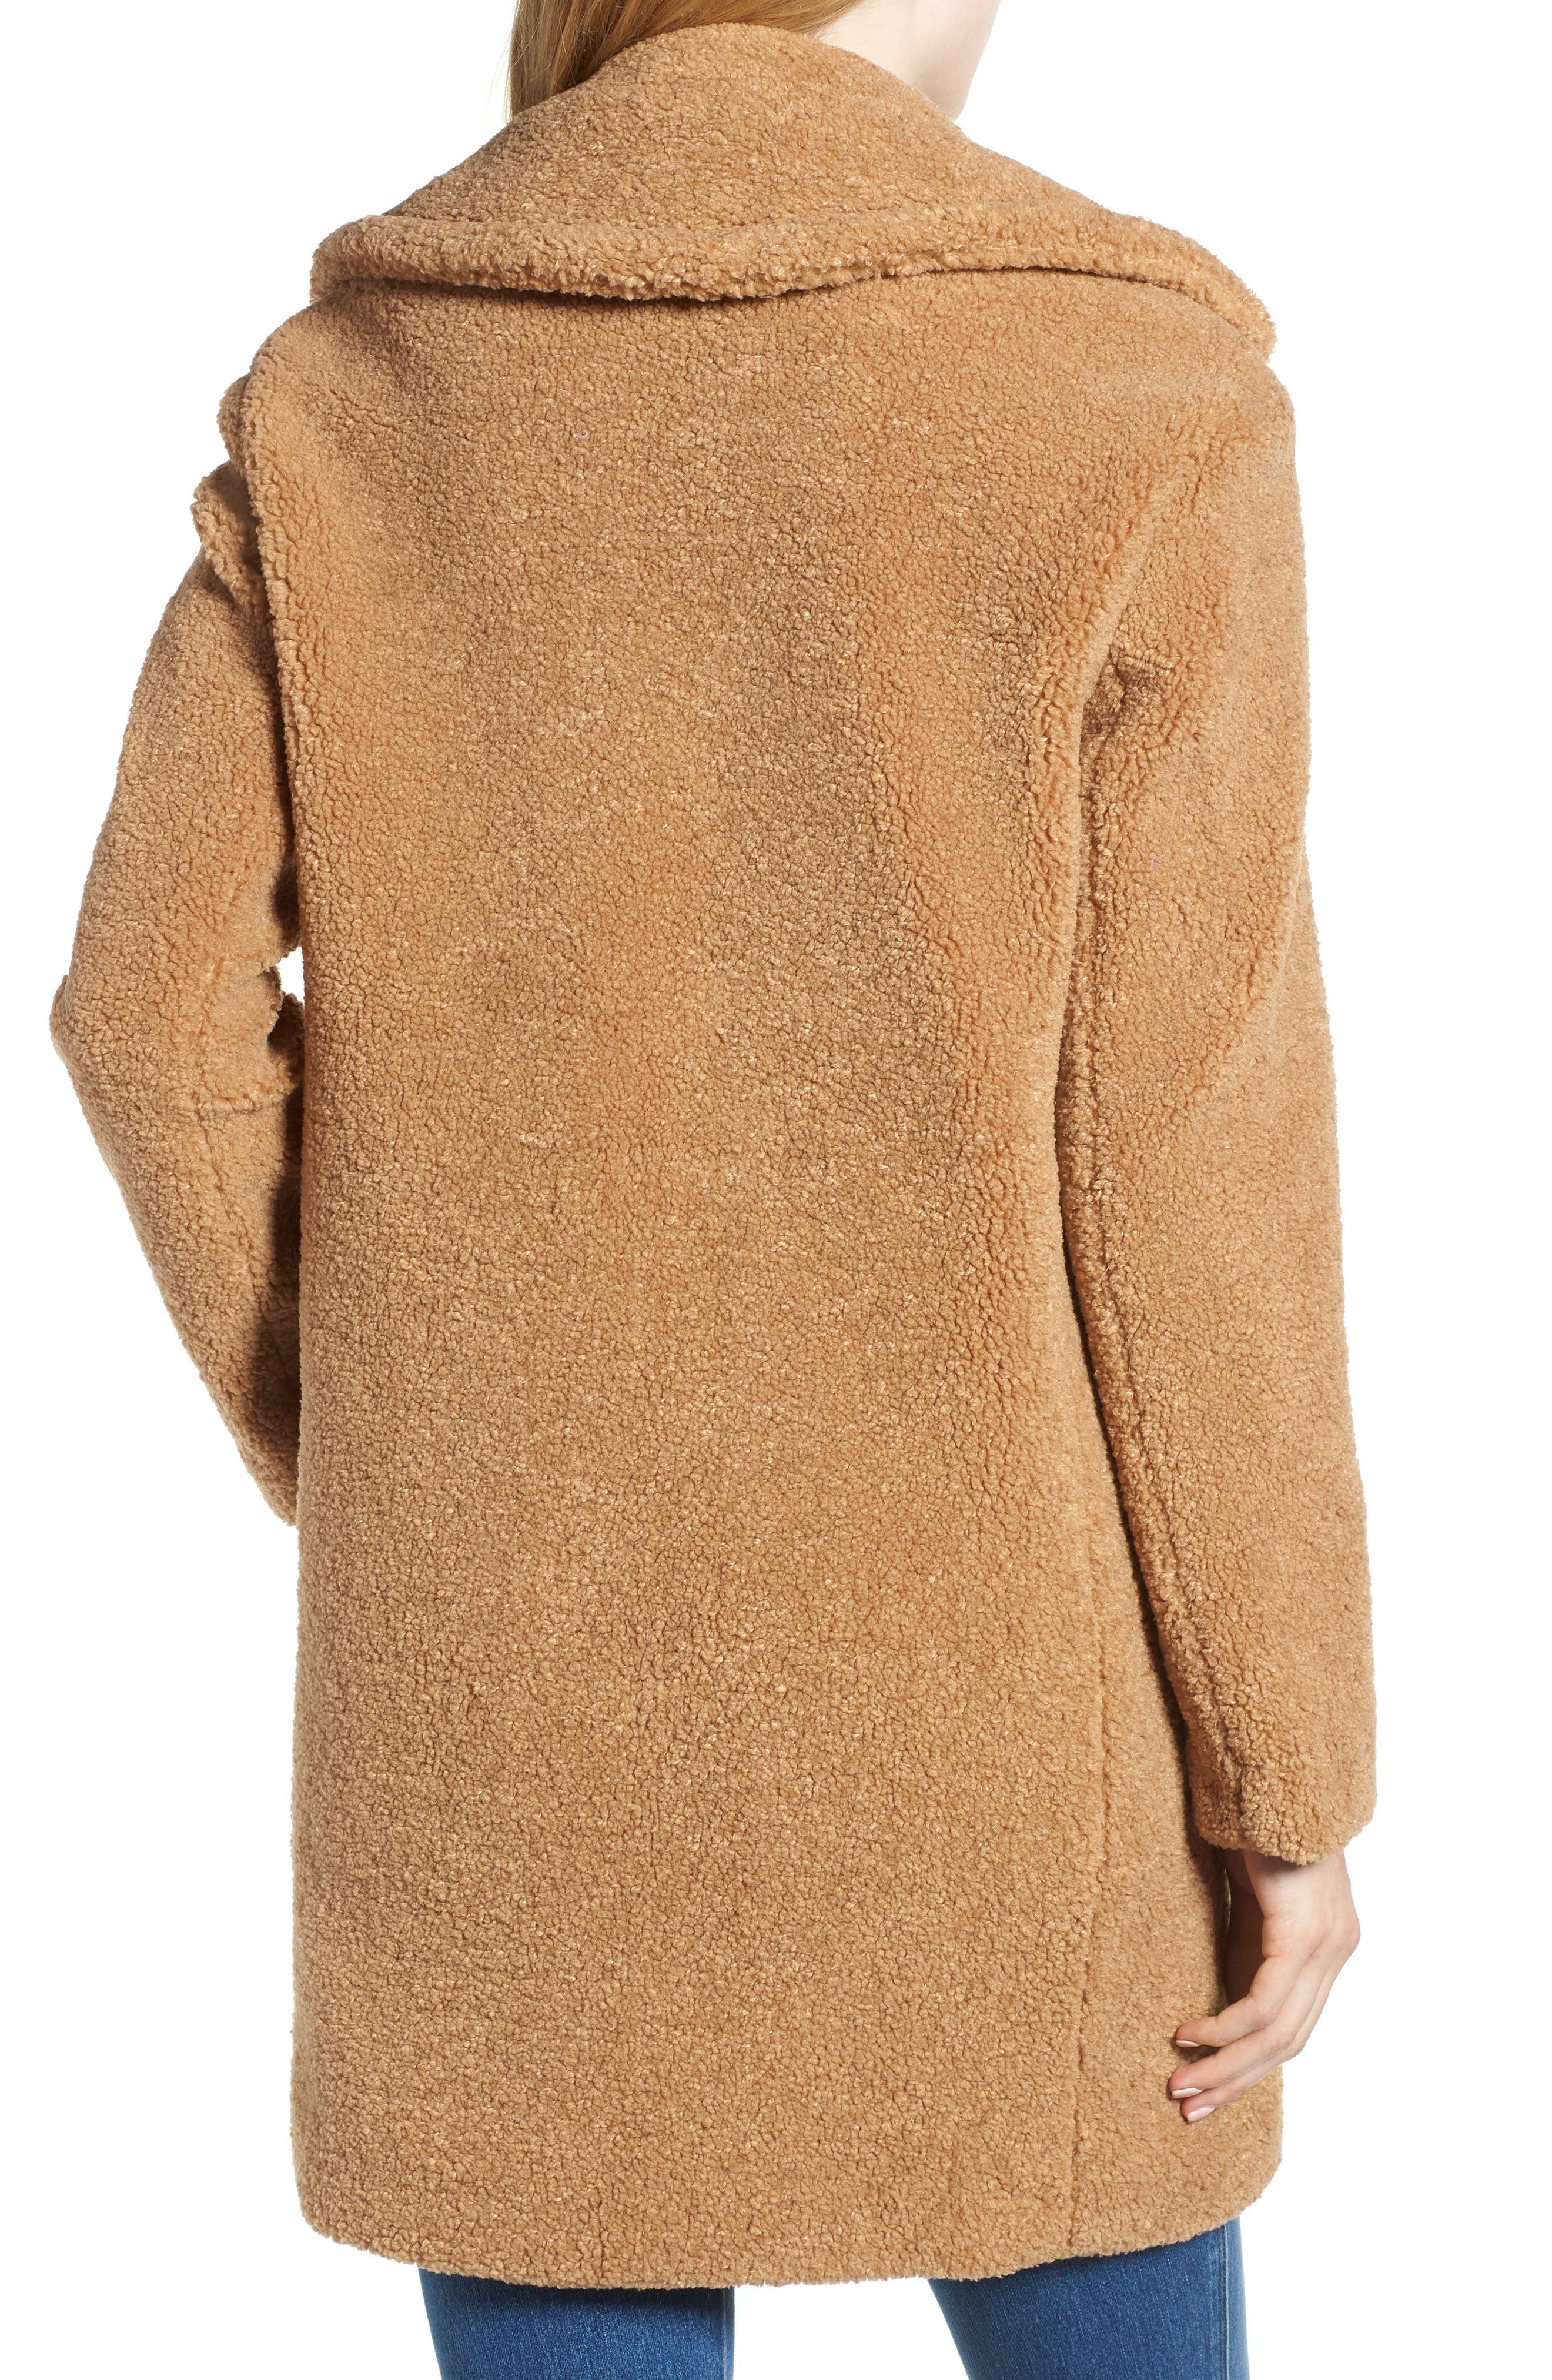 Faux Fur Teddy Bear Coat,                             Alternate thumbnail 2, color,                             256